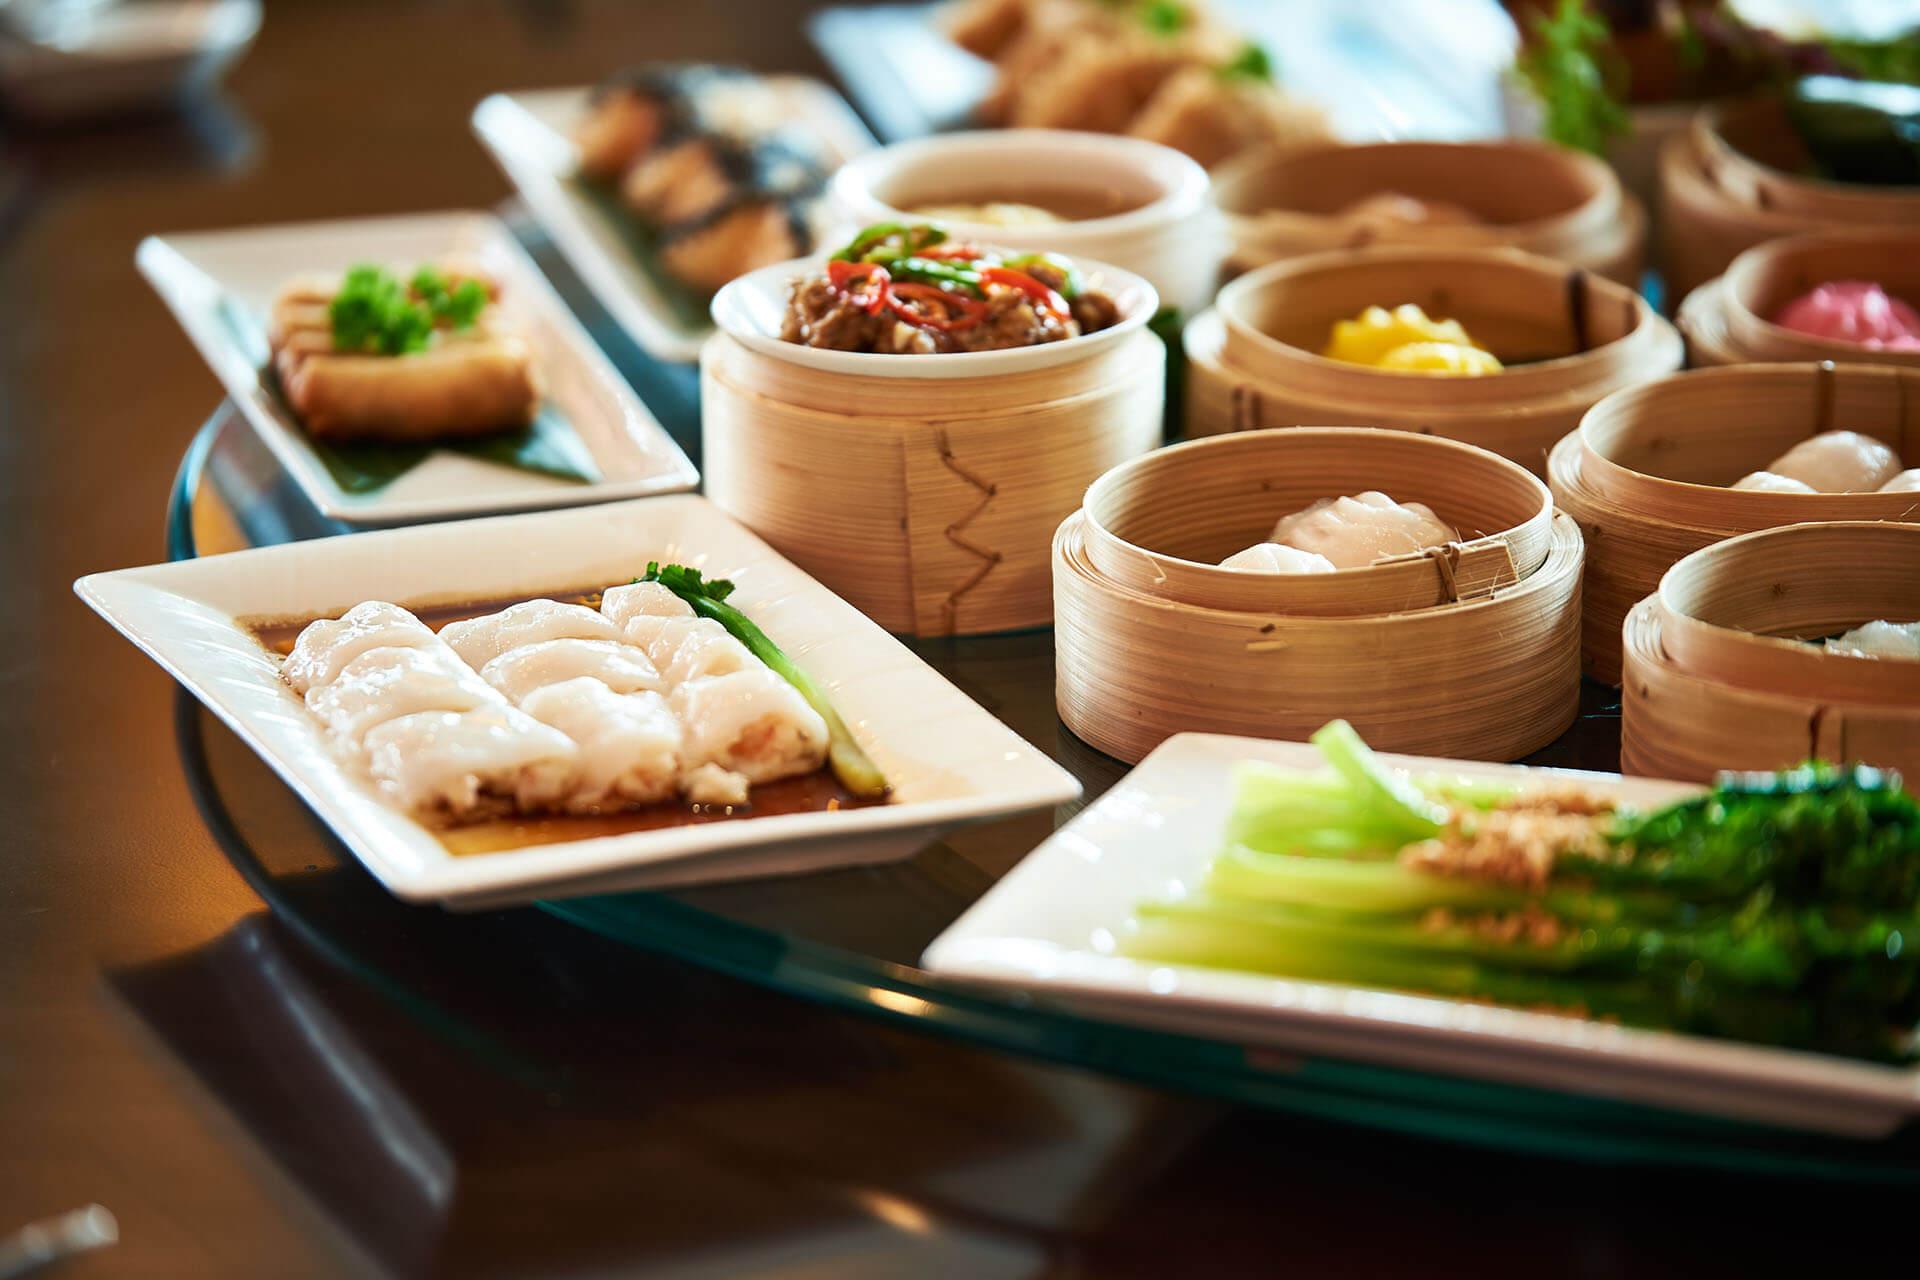 Tiec Buffet Trung Hoa Mung Ngay Quoc Te Phu Nu Tai Grand Mercure Danang 01